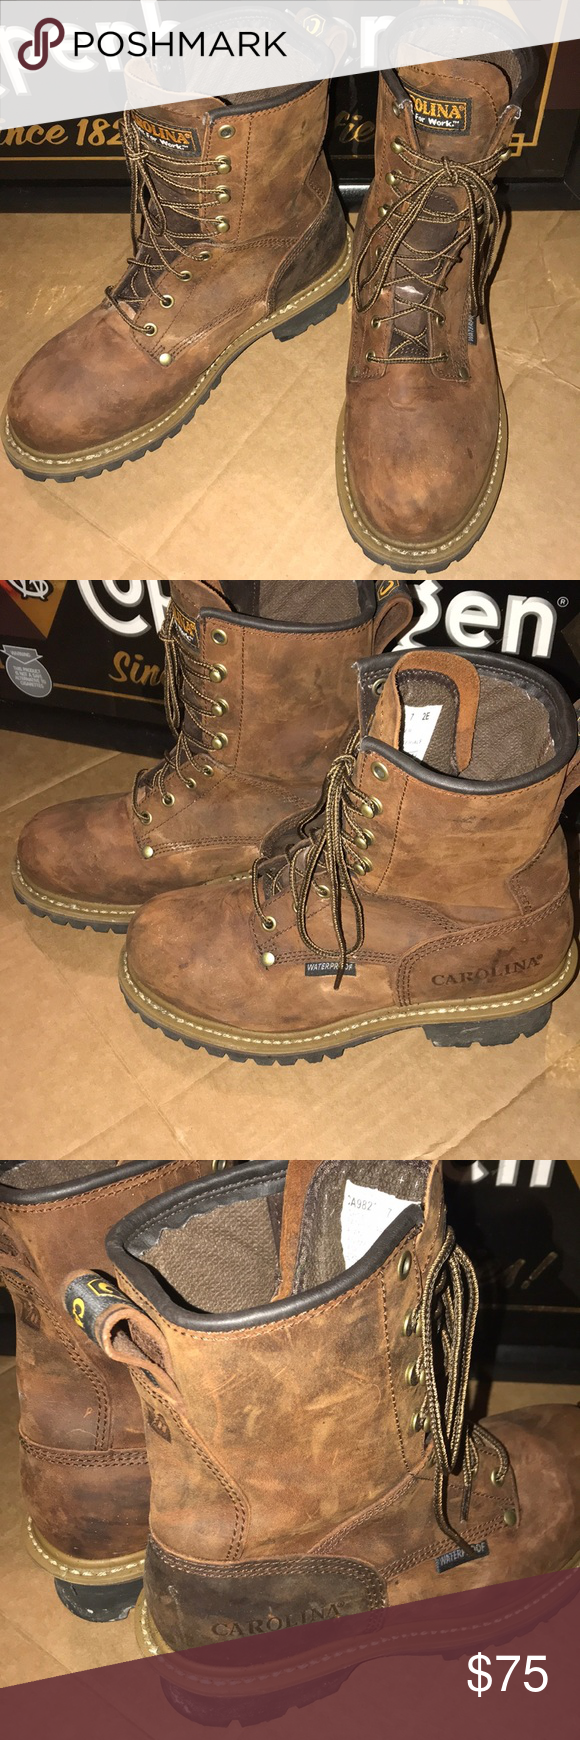 9f4fafb3b41 Carolina Men's Elm Steel Toe Waterproof Logger These are in ...